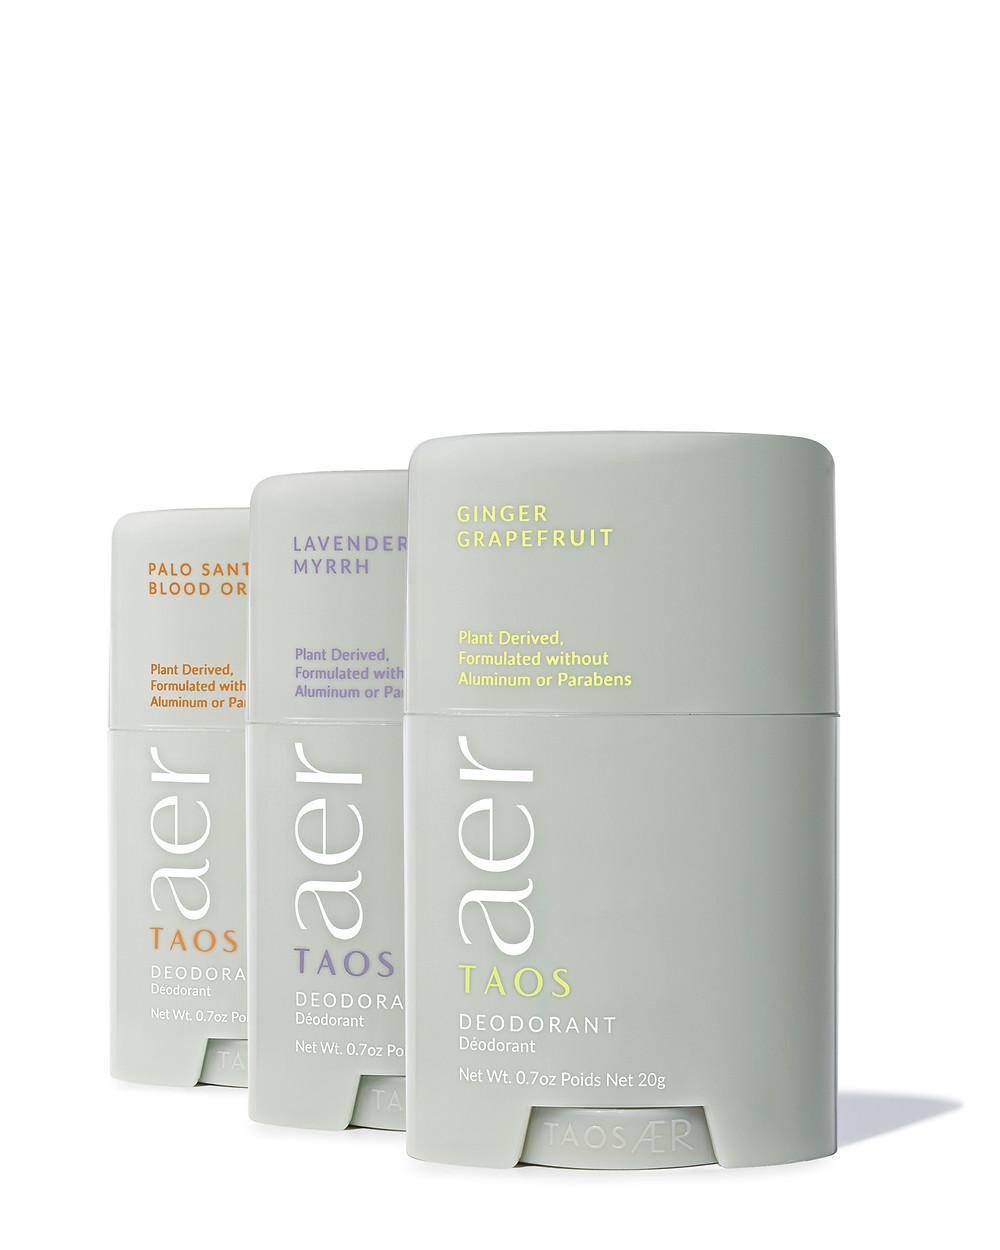 Mini natural deodorants